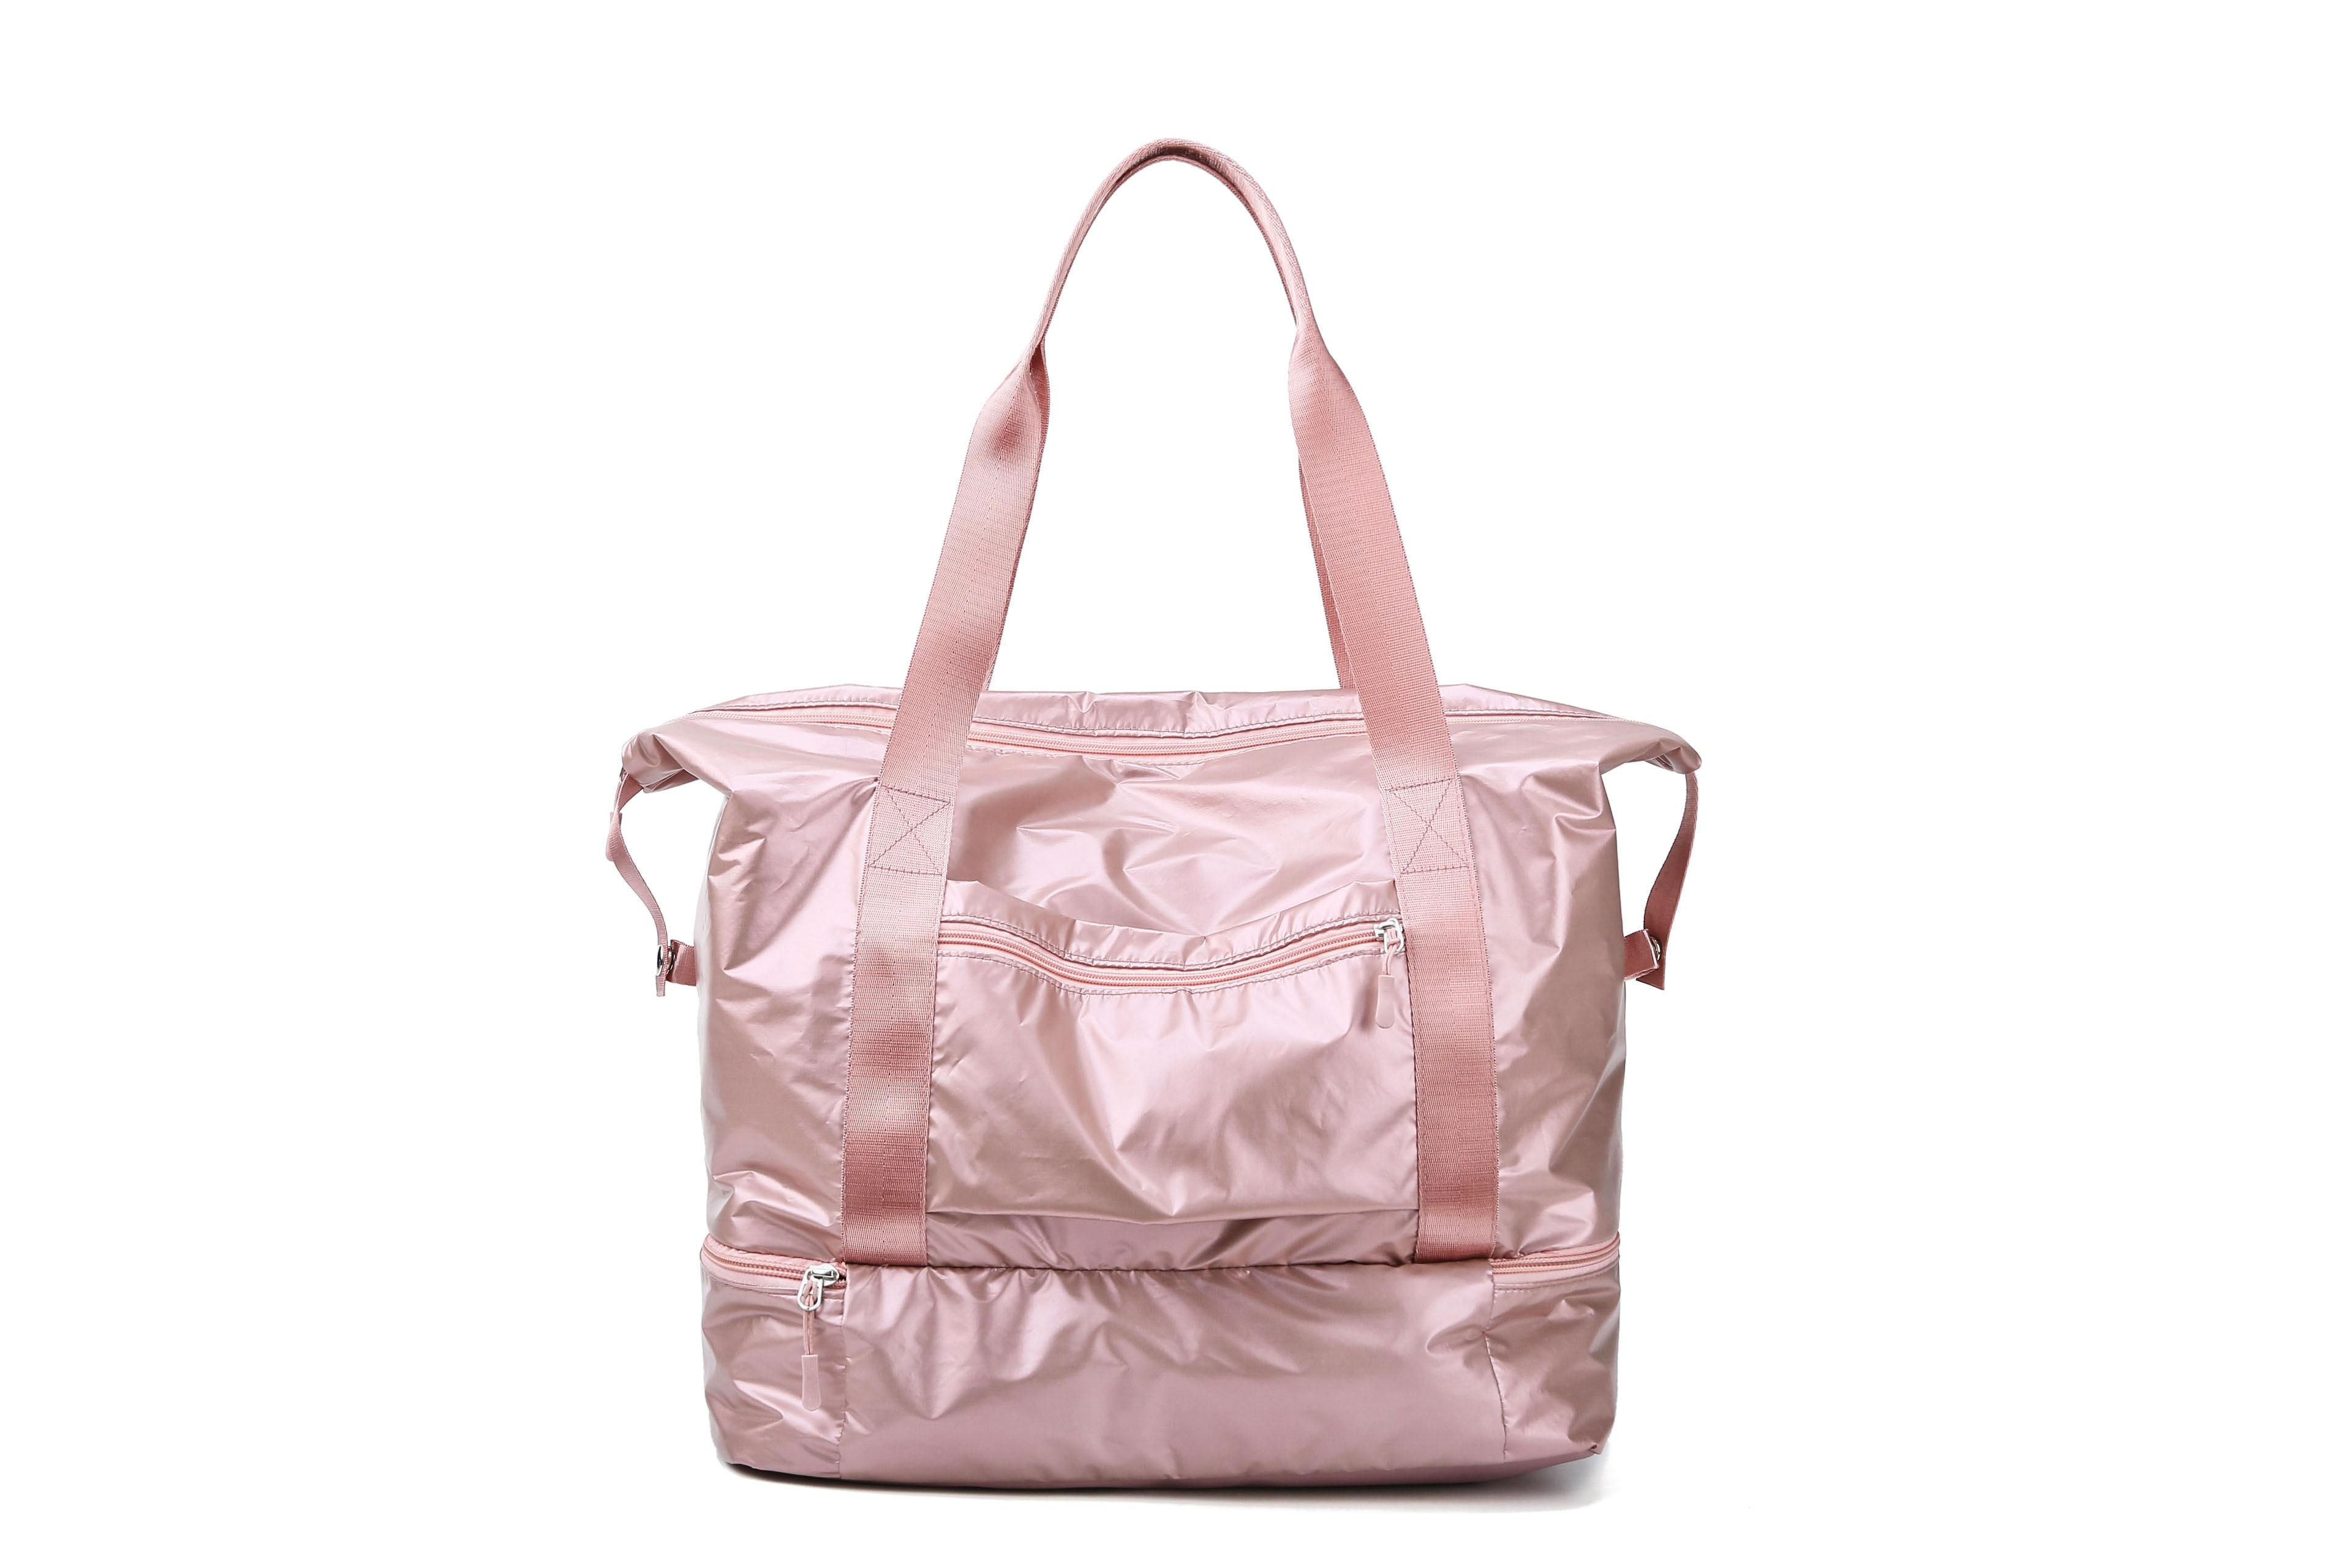 Women Handbag Fitness Bag Unisex Couple Casual Nylon Shoulder Bag High Quality Travel Handbag Fashion Designer High Capacity Bag Top Handle Bags Aliexpress